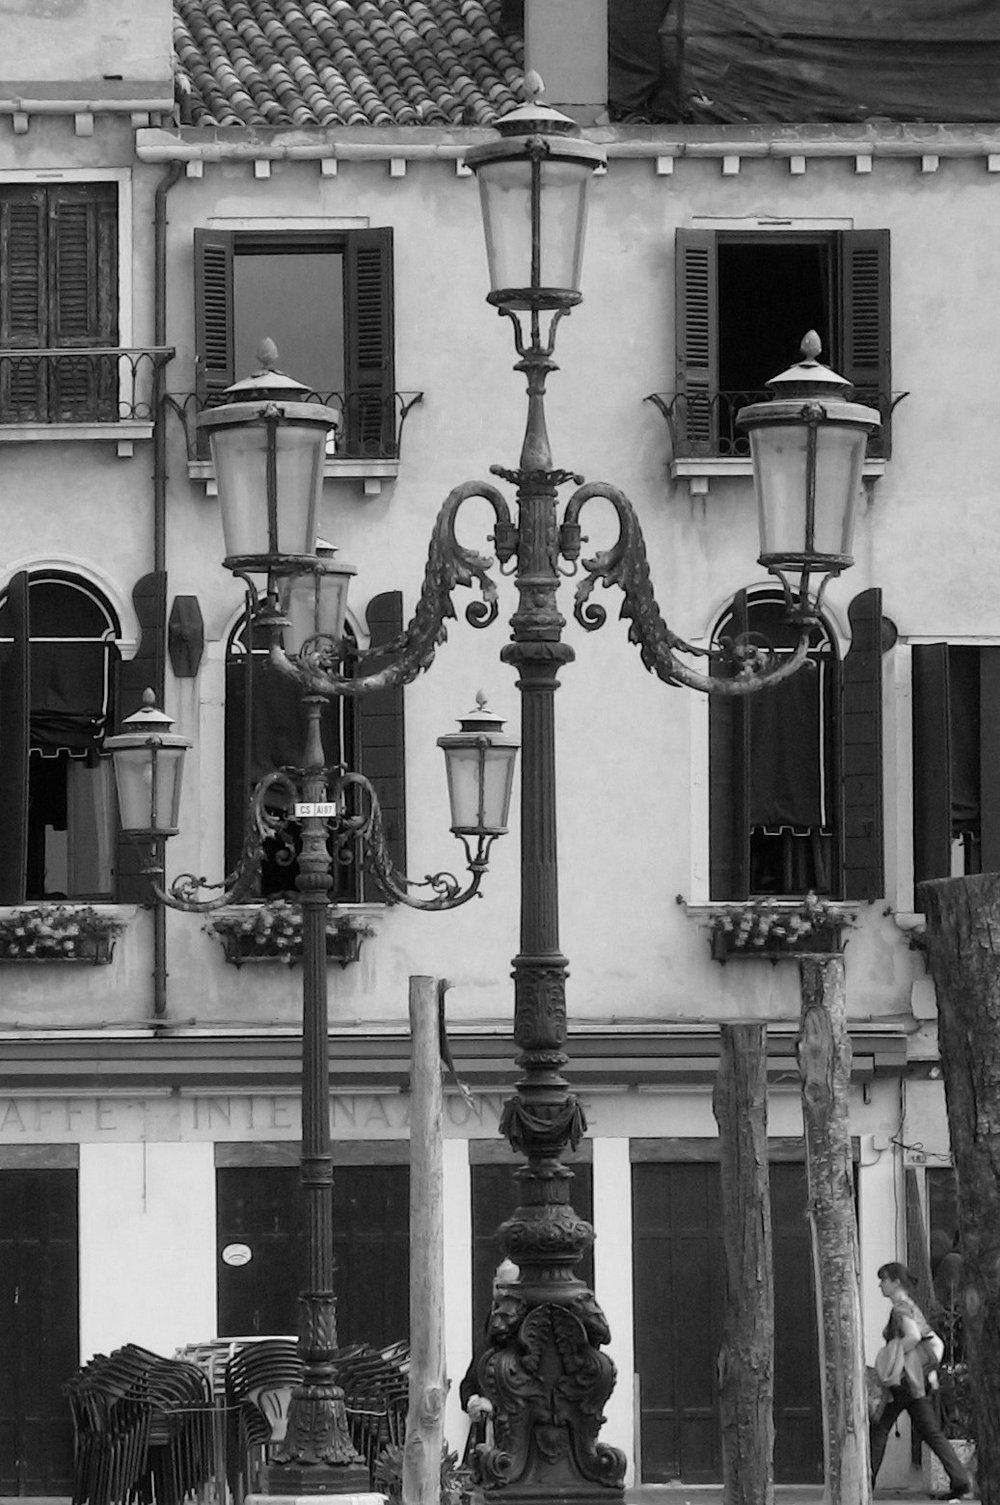 Venice Gas Lamps